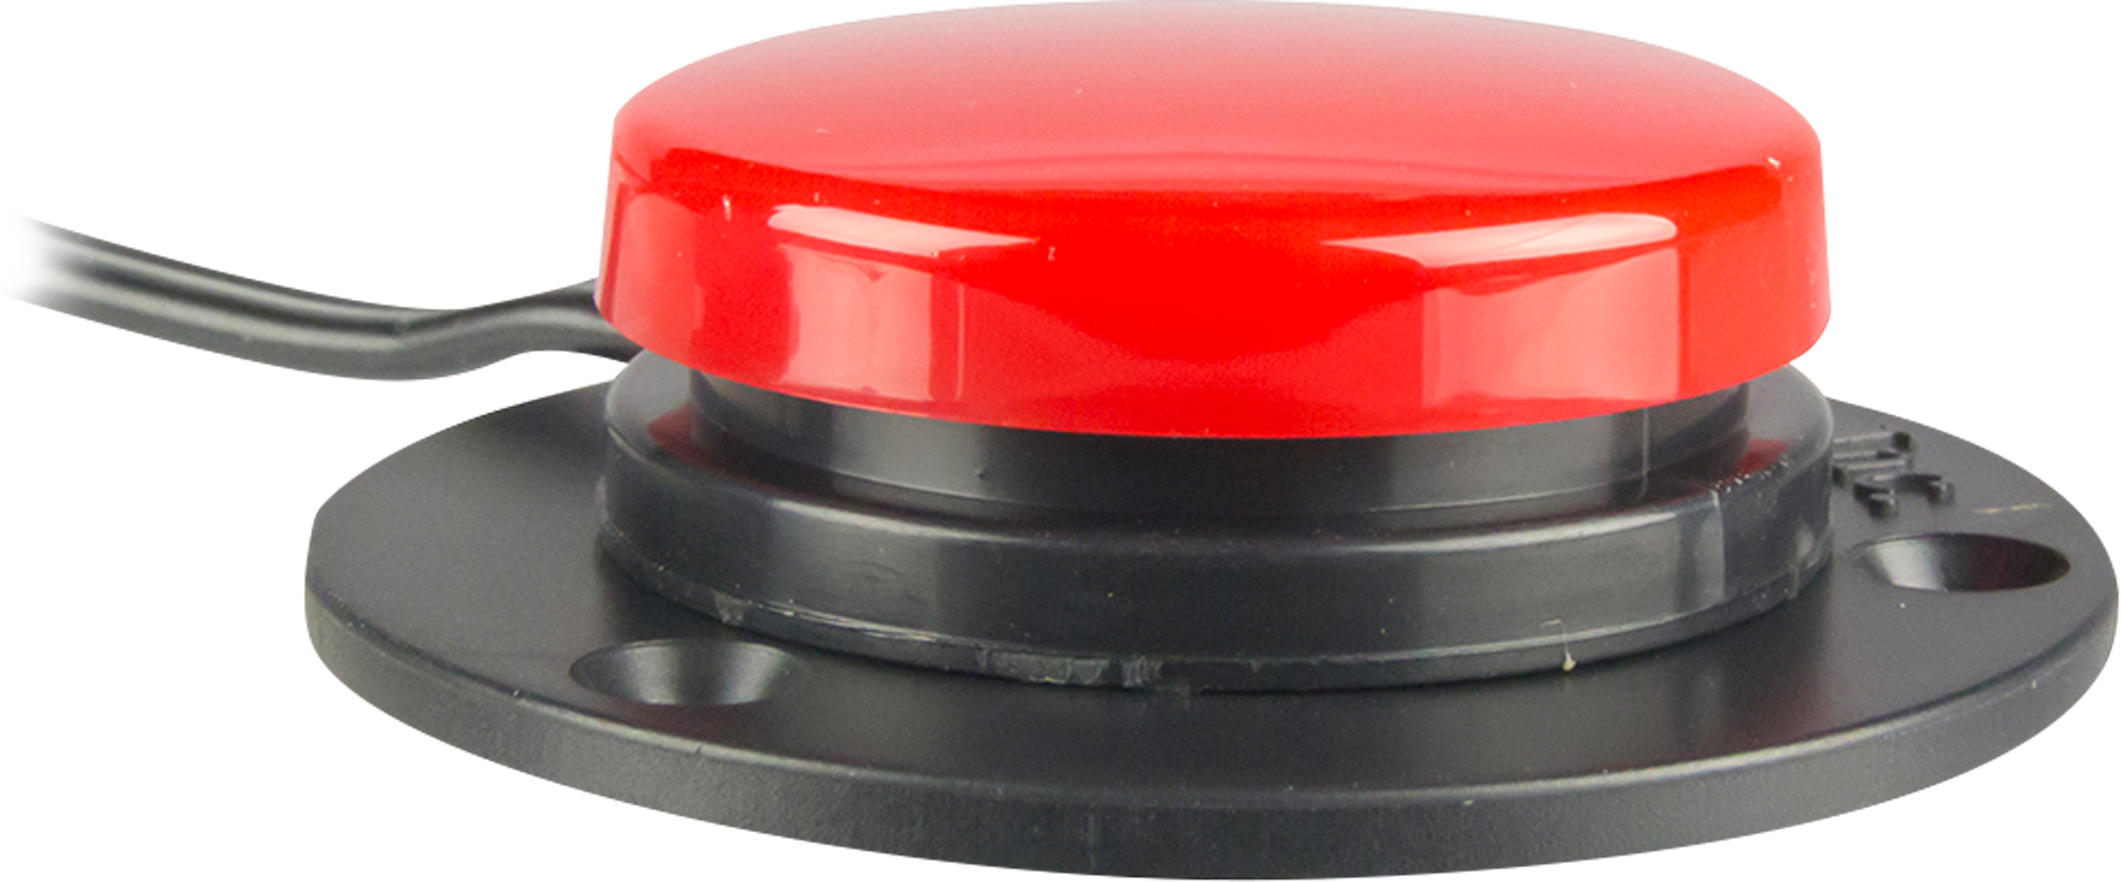 Roter Taster für den Xbox Adaptive Controller